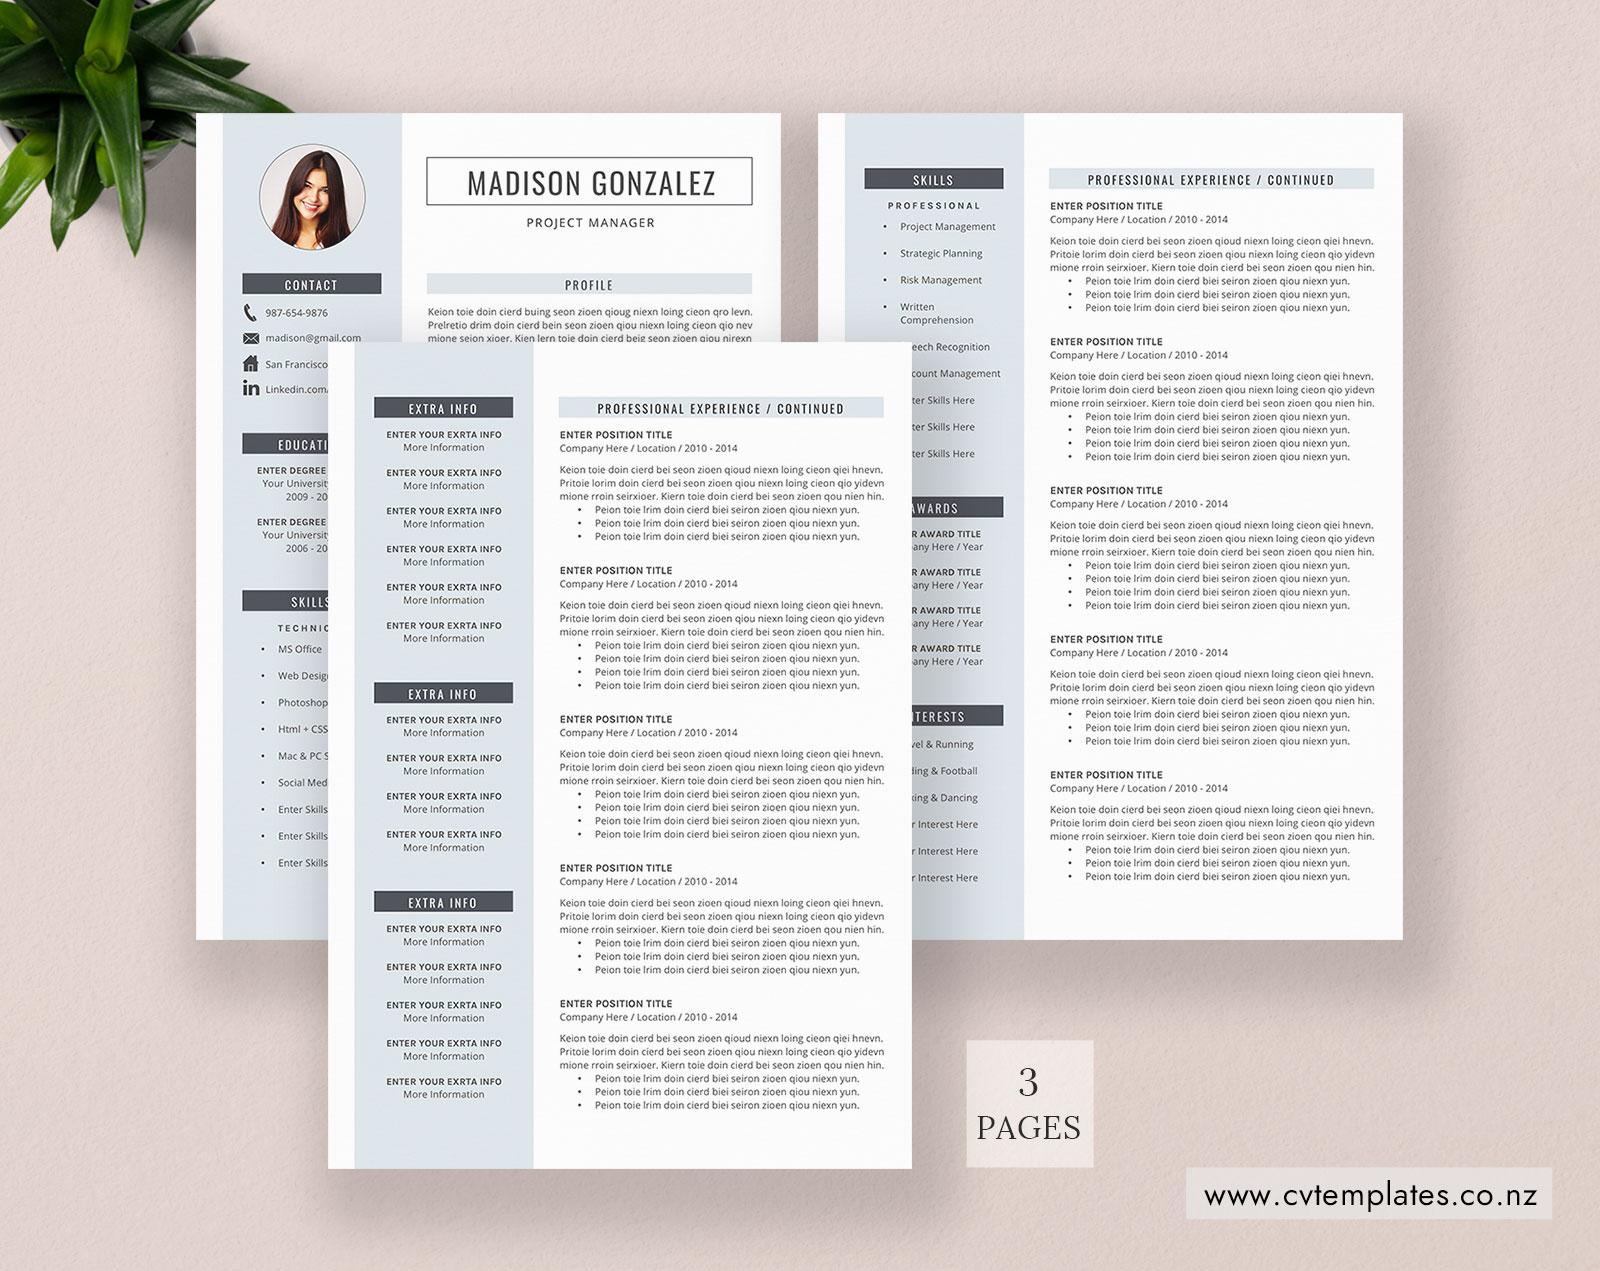 cv template  professional curriculum vitae  minimalist cv template design  ms word  cover letter